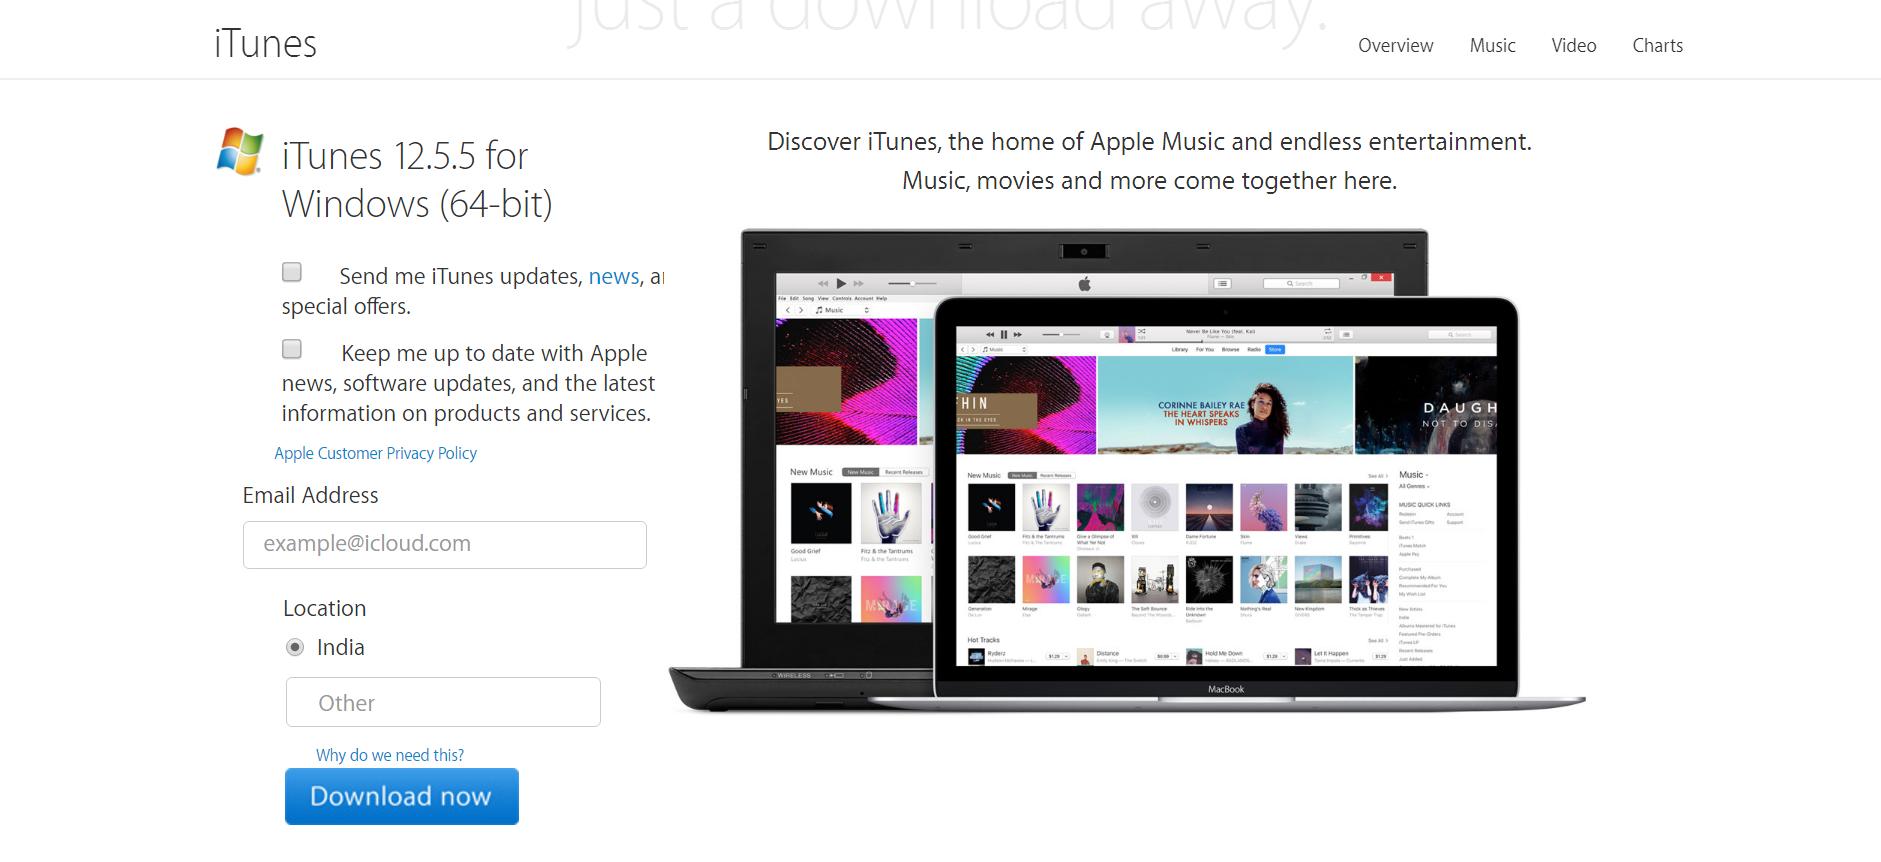 download apple itunes for windows 10 64 bit